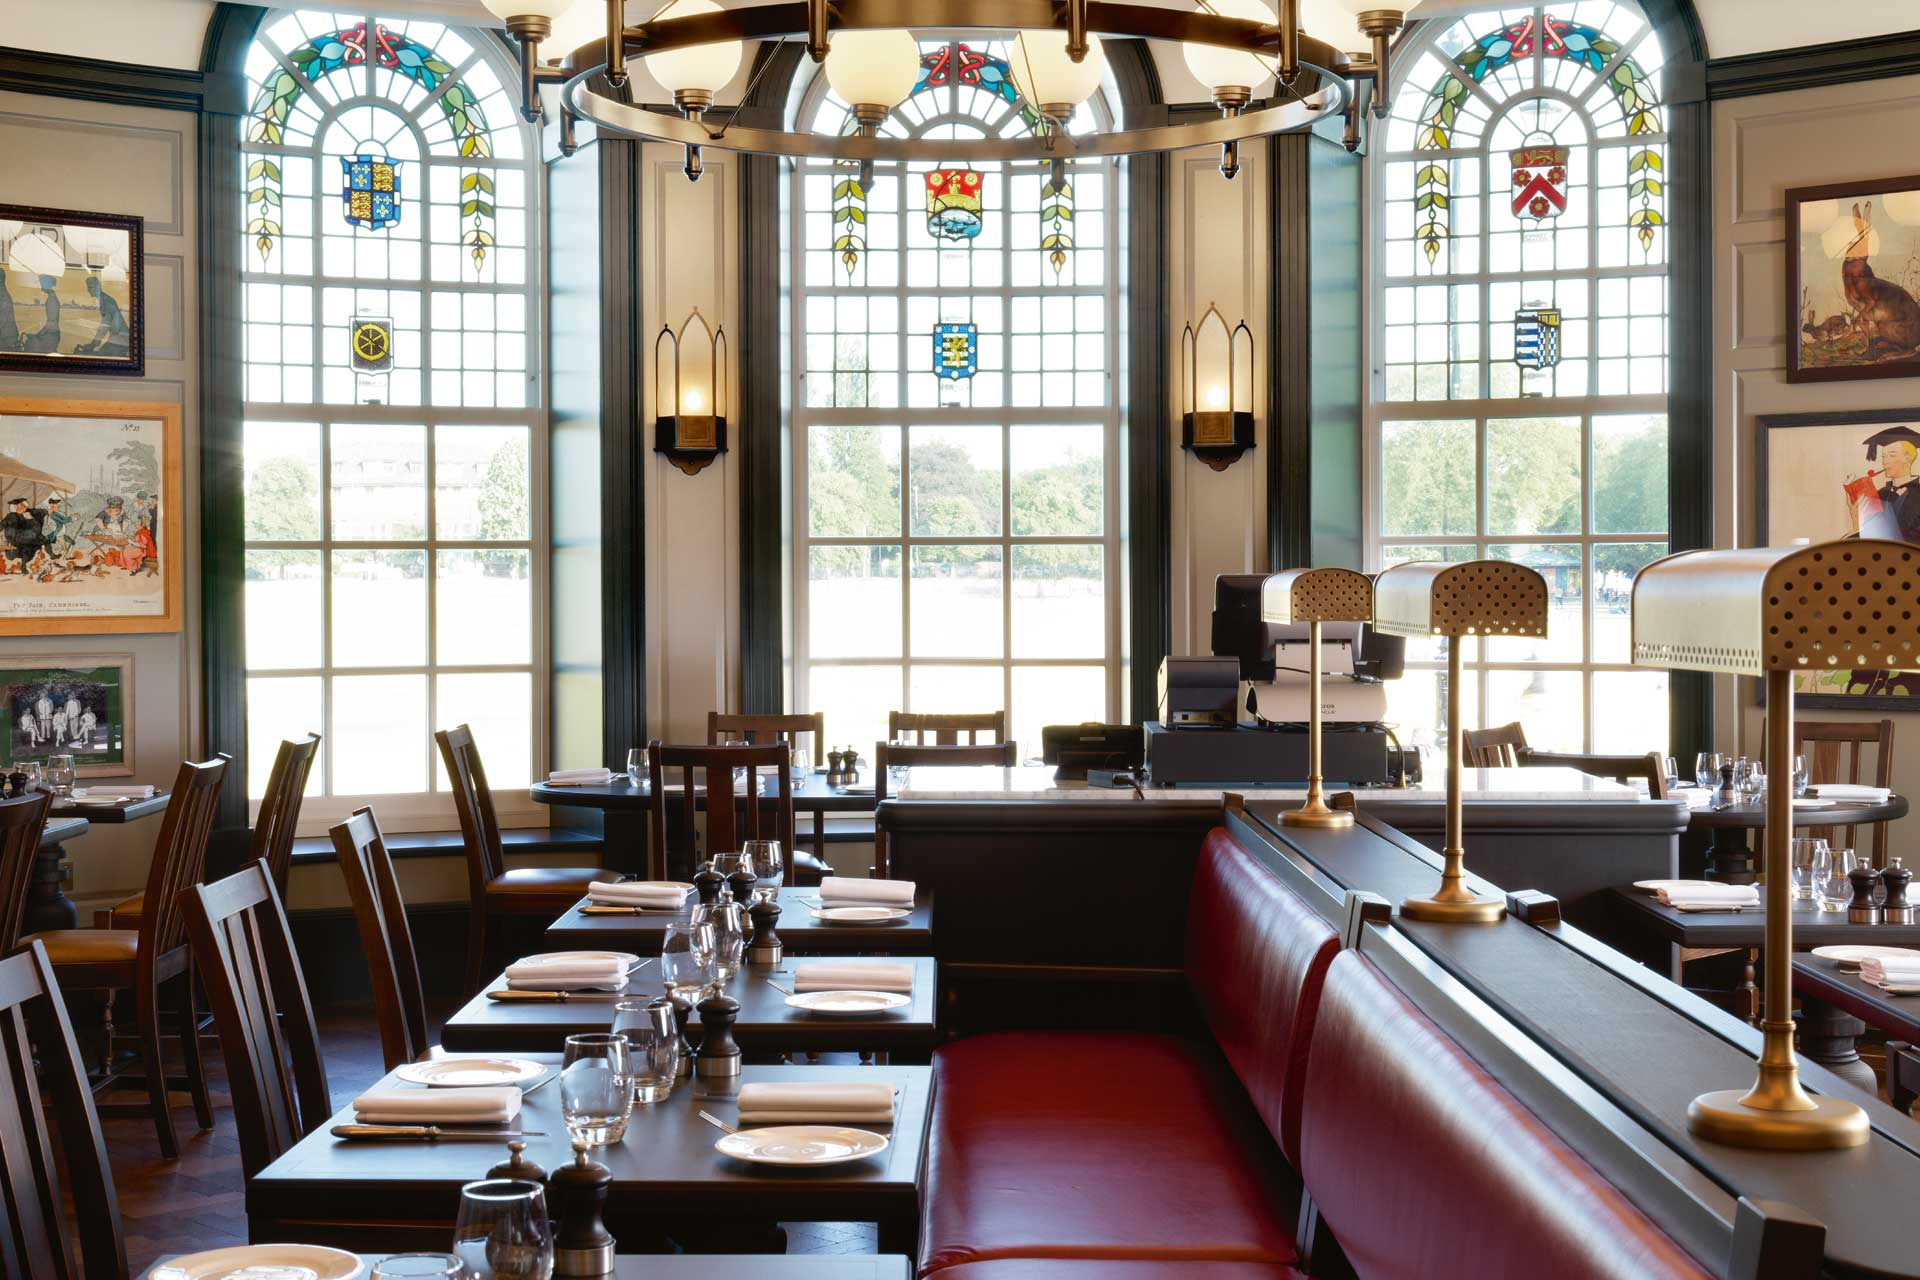 Parker's Tavern in Cambridge was designed by Martin Brudnizki Design Studio